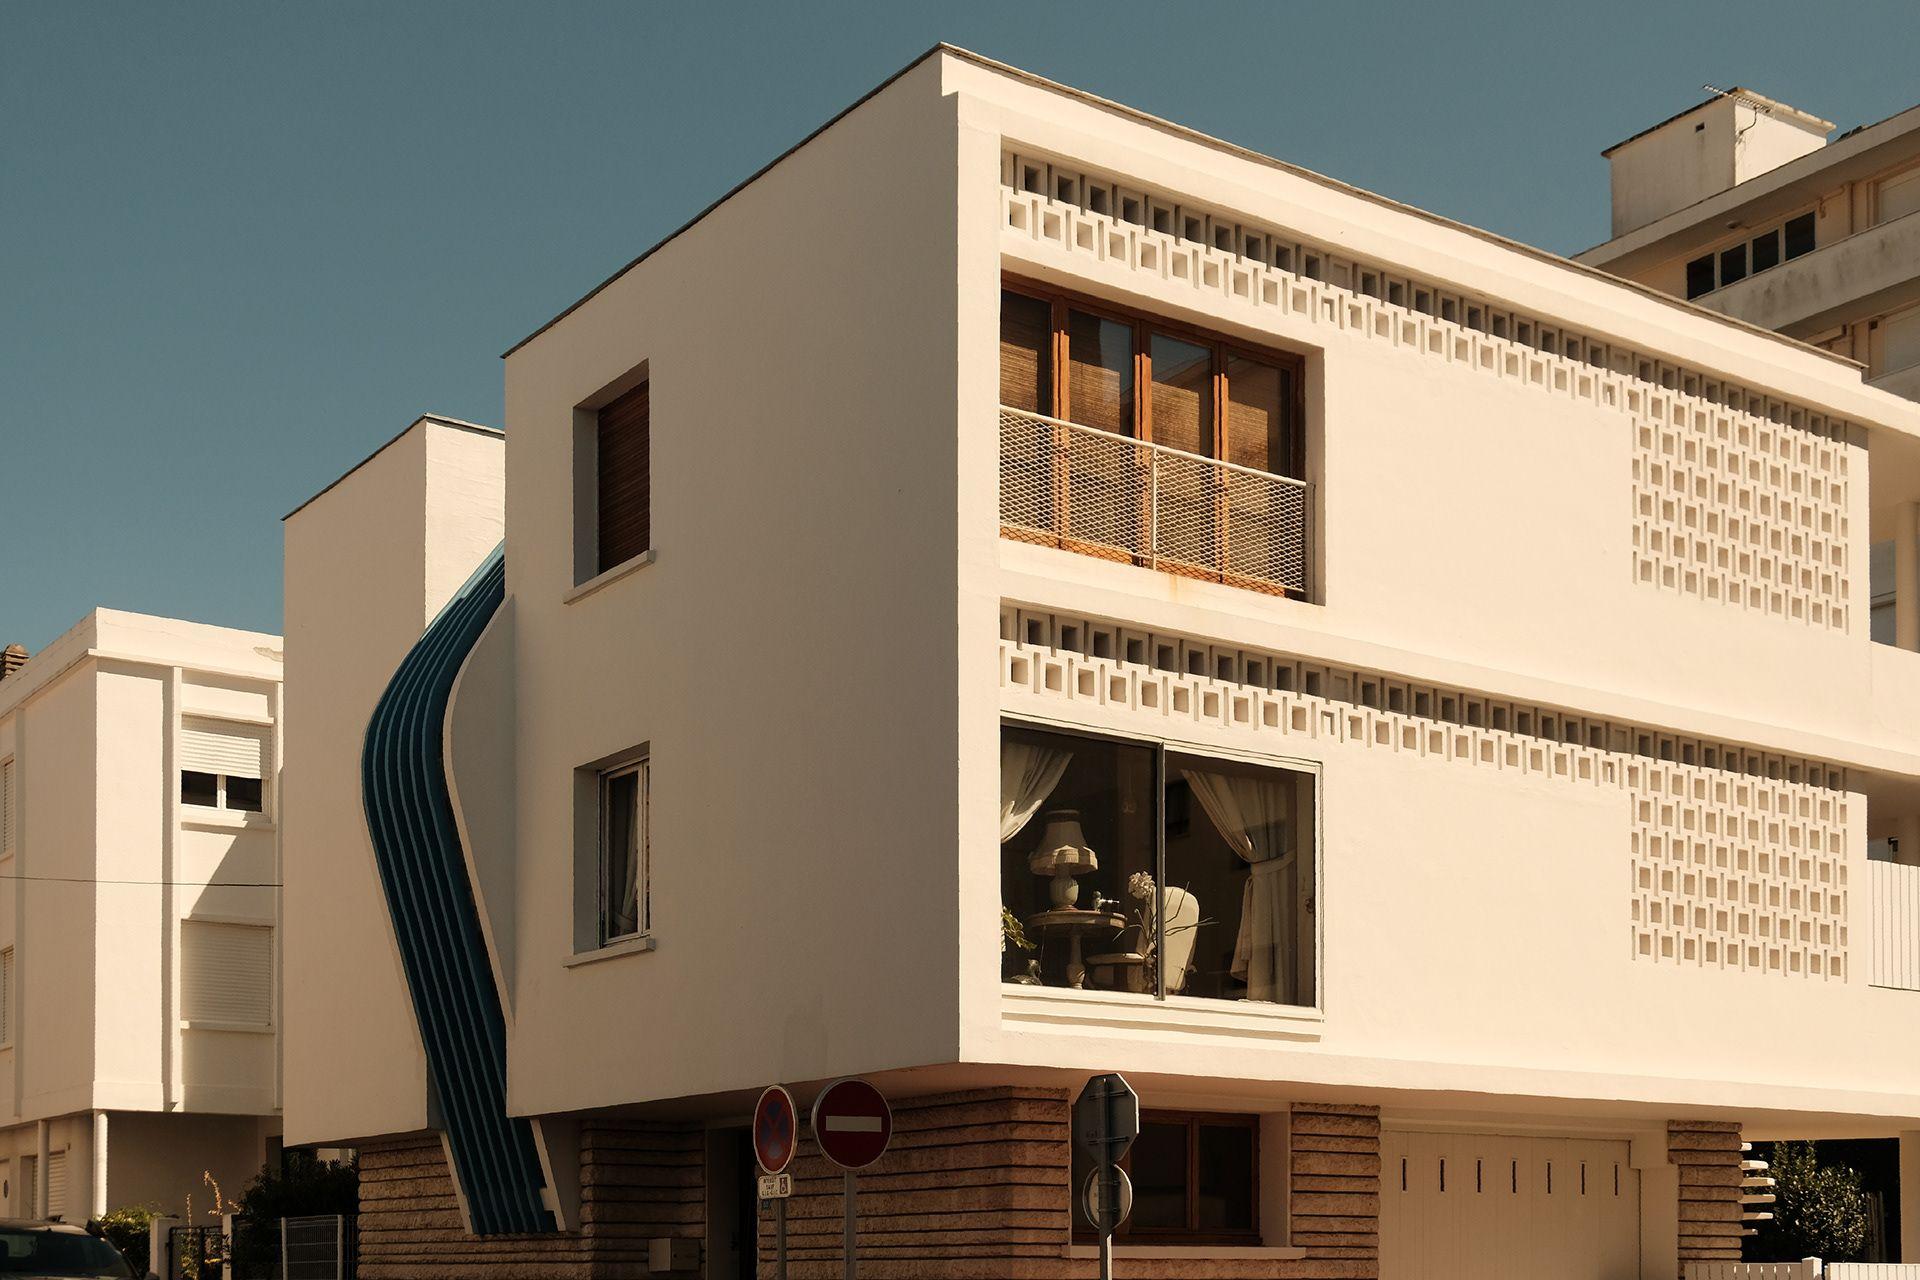 Royan France Morgane Leduc On Behance Modernism Light